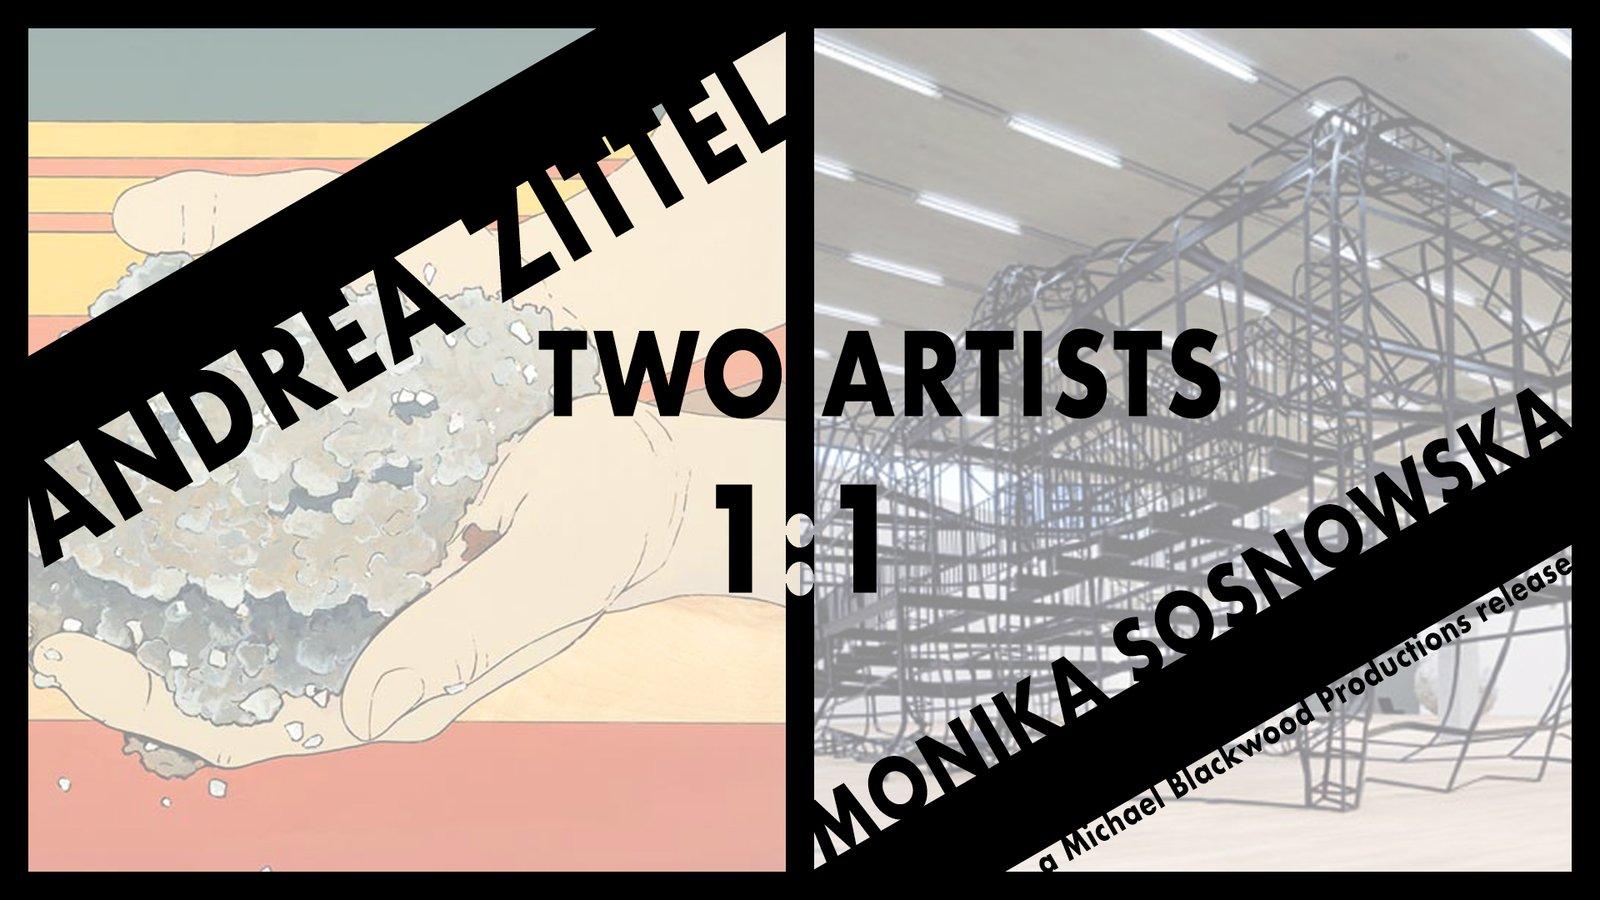 Two Artists: Andrea Zittel and Monika Sosnowska 1:1